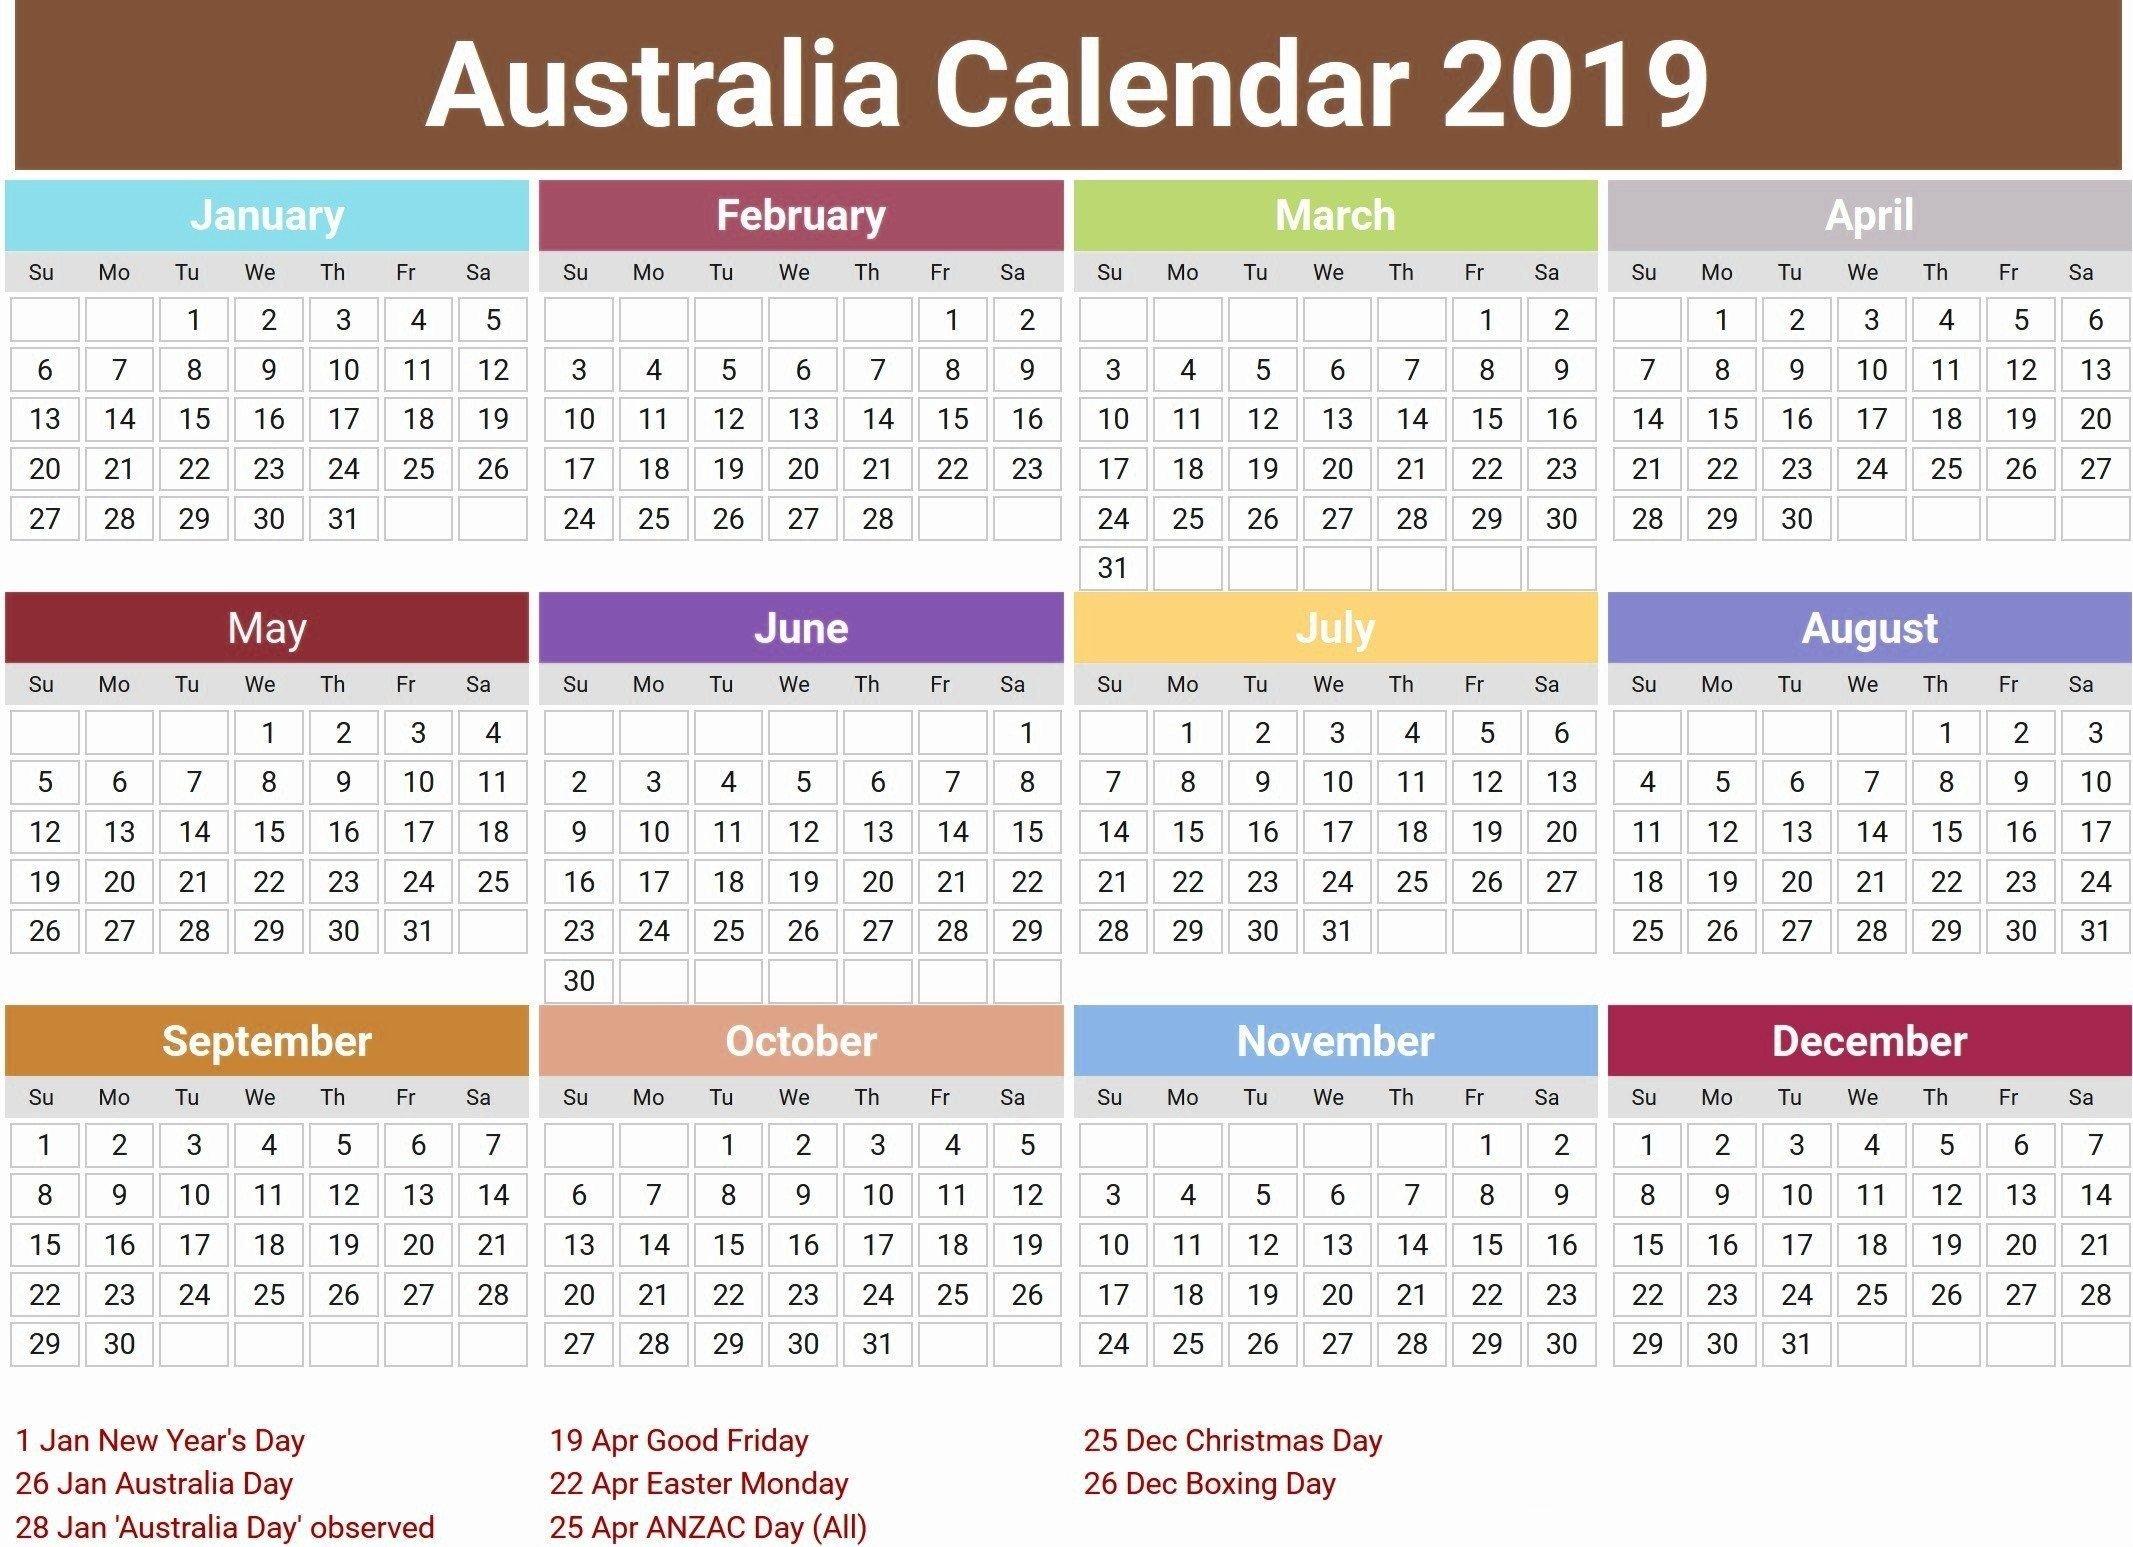 Australia 2019 Calendar With Holidays | Printable Calendar 2019 Calendar 2019 Australia